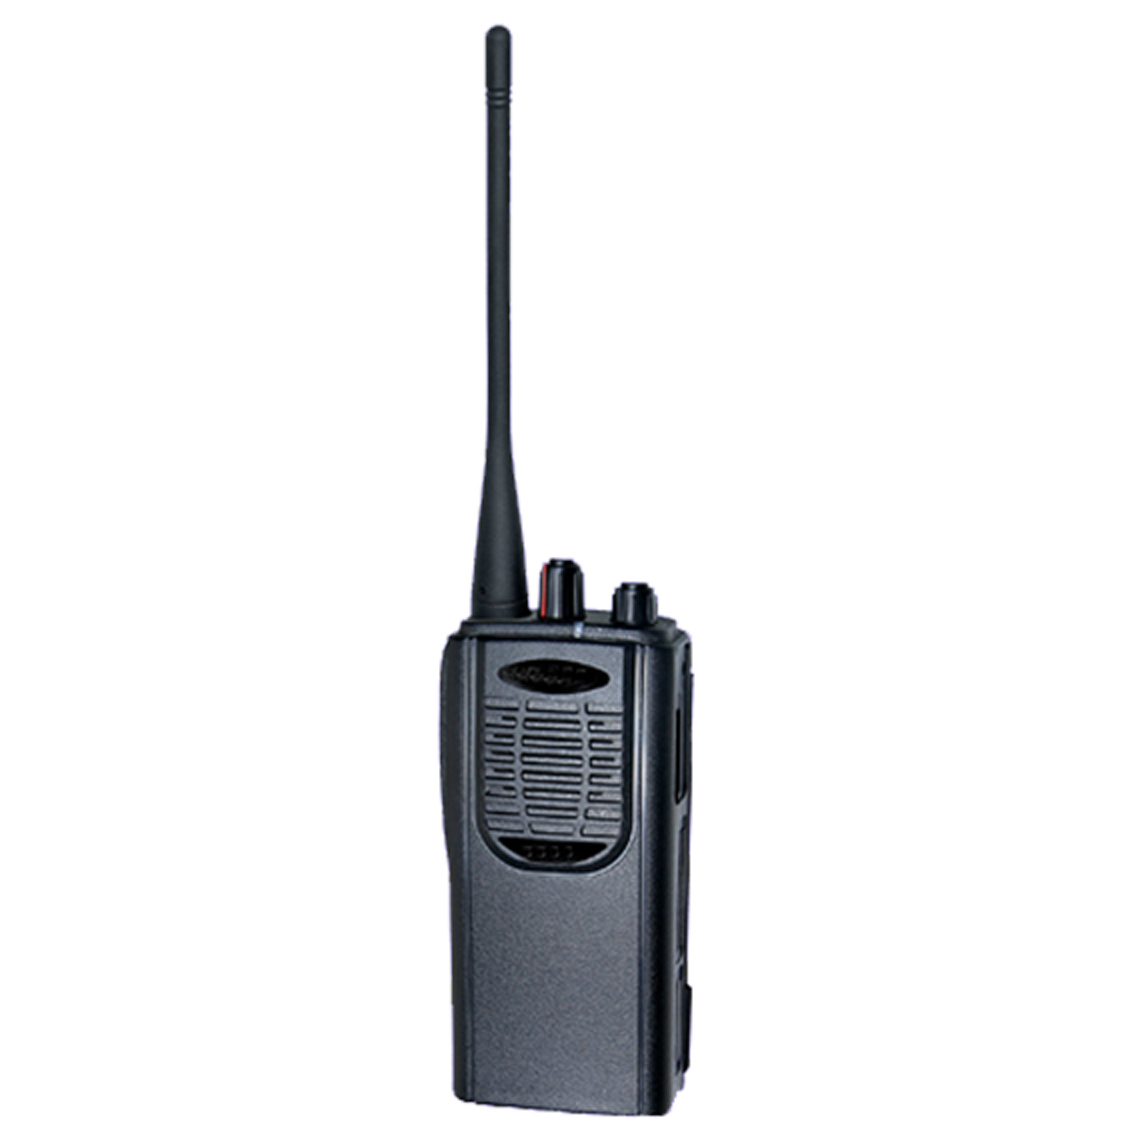 walkie talkie 2 way radio. Black Bedroom Furniture Sets. Home Design Ideas